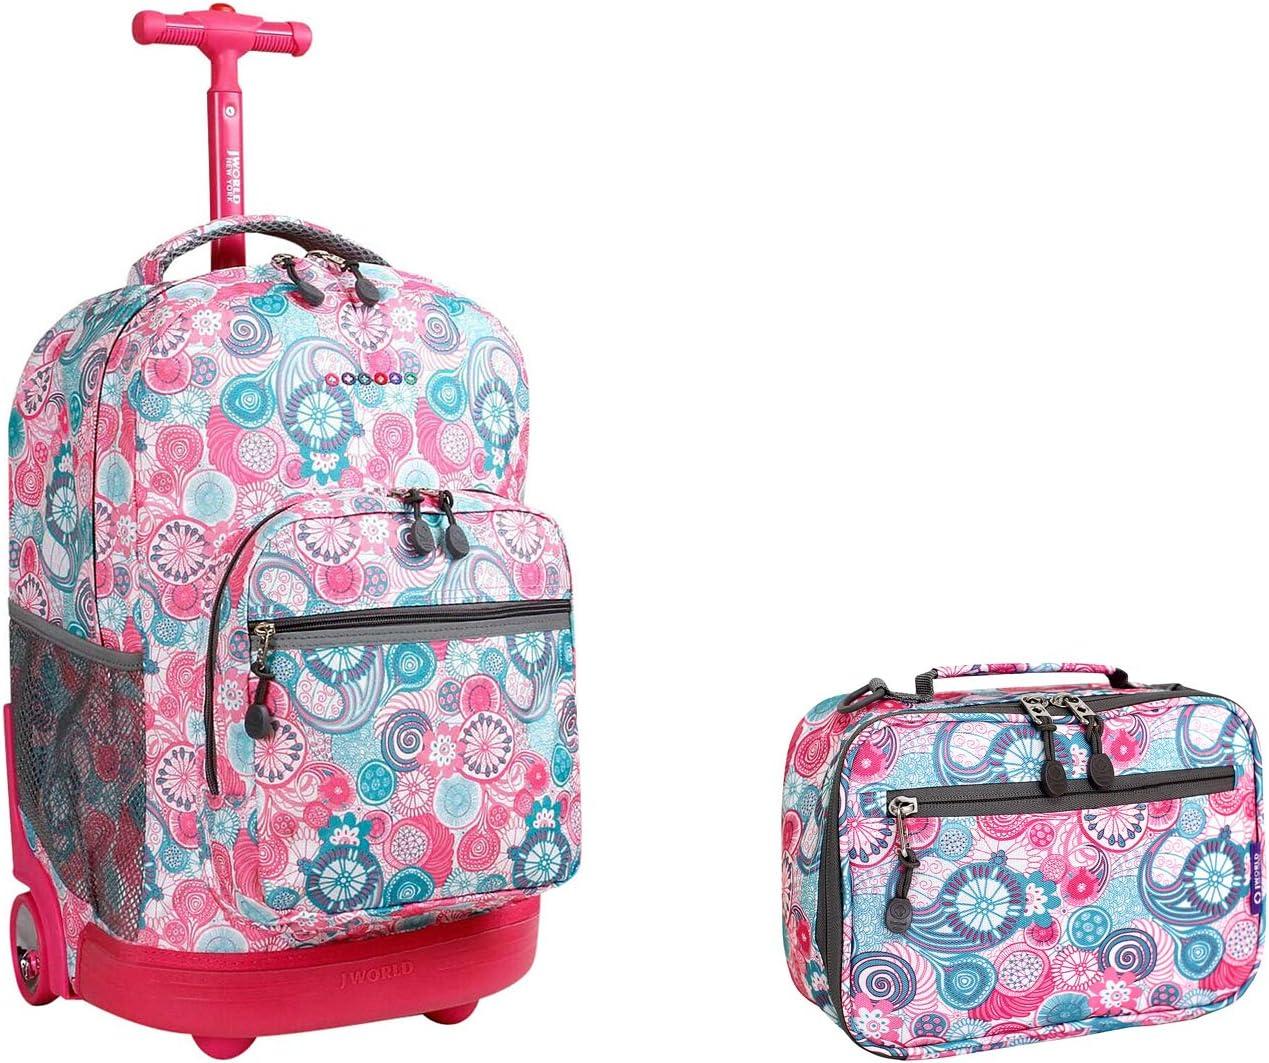 J World New York Sunrise Indefinitely Rolling Corey Backpack Lunch bag Finally popular brand Set